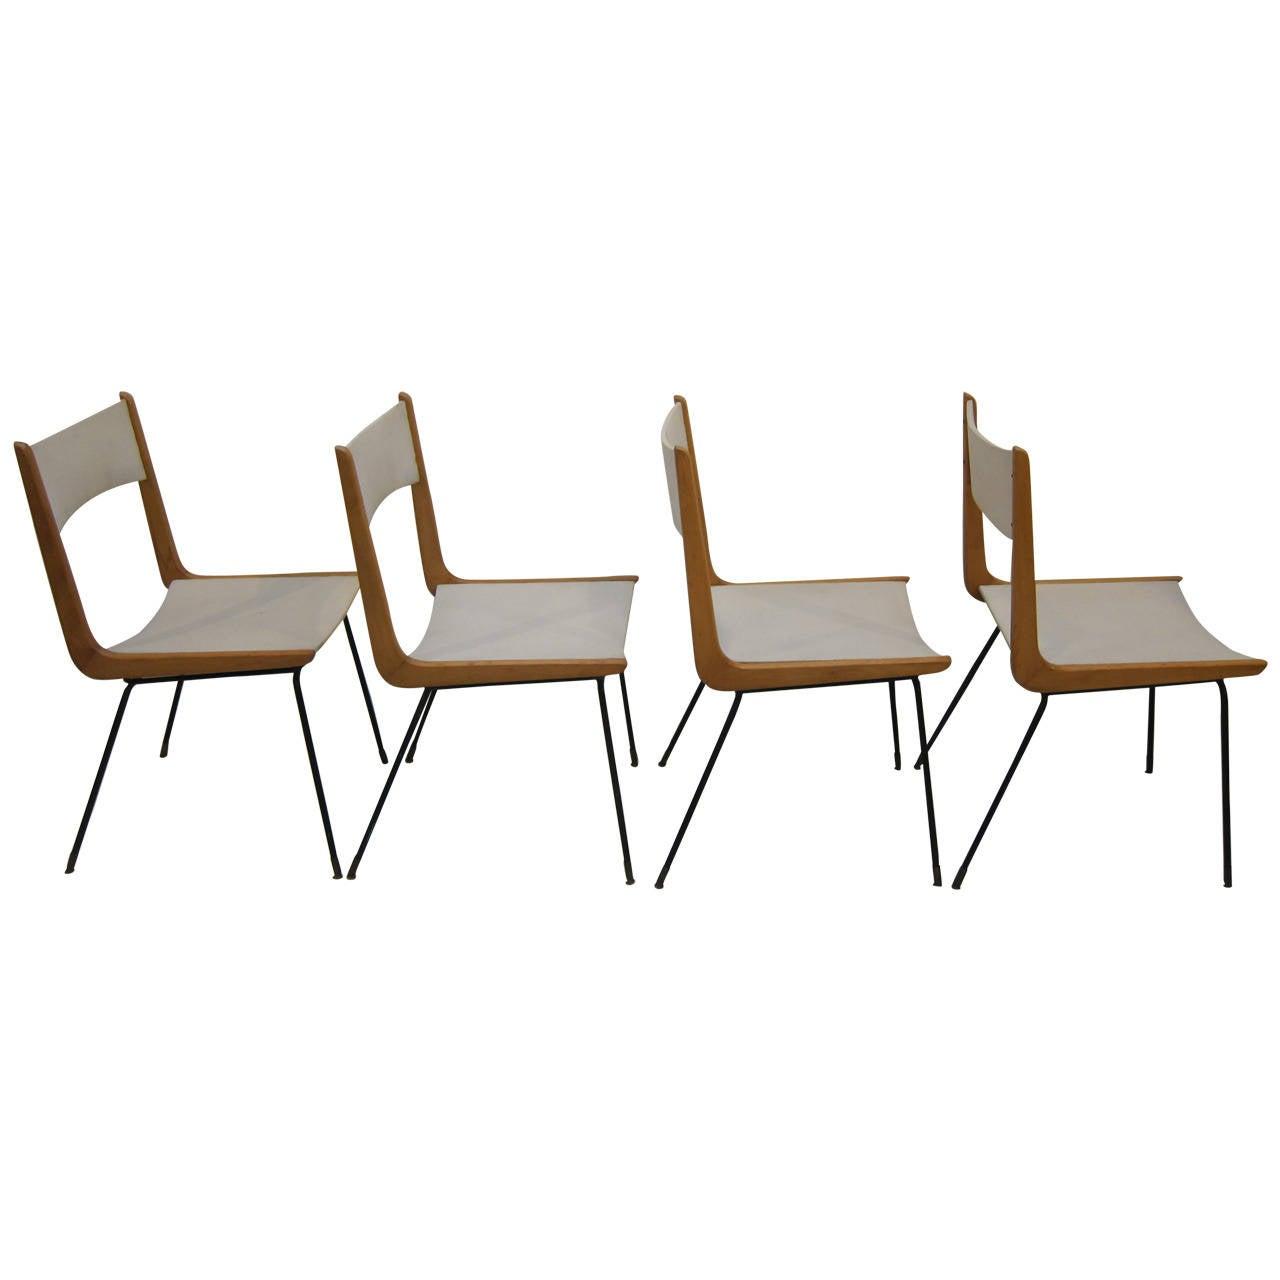 Set of Four Chairs, Style of Carlo Di Carli